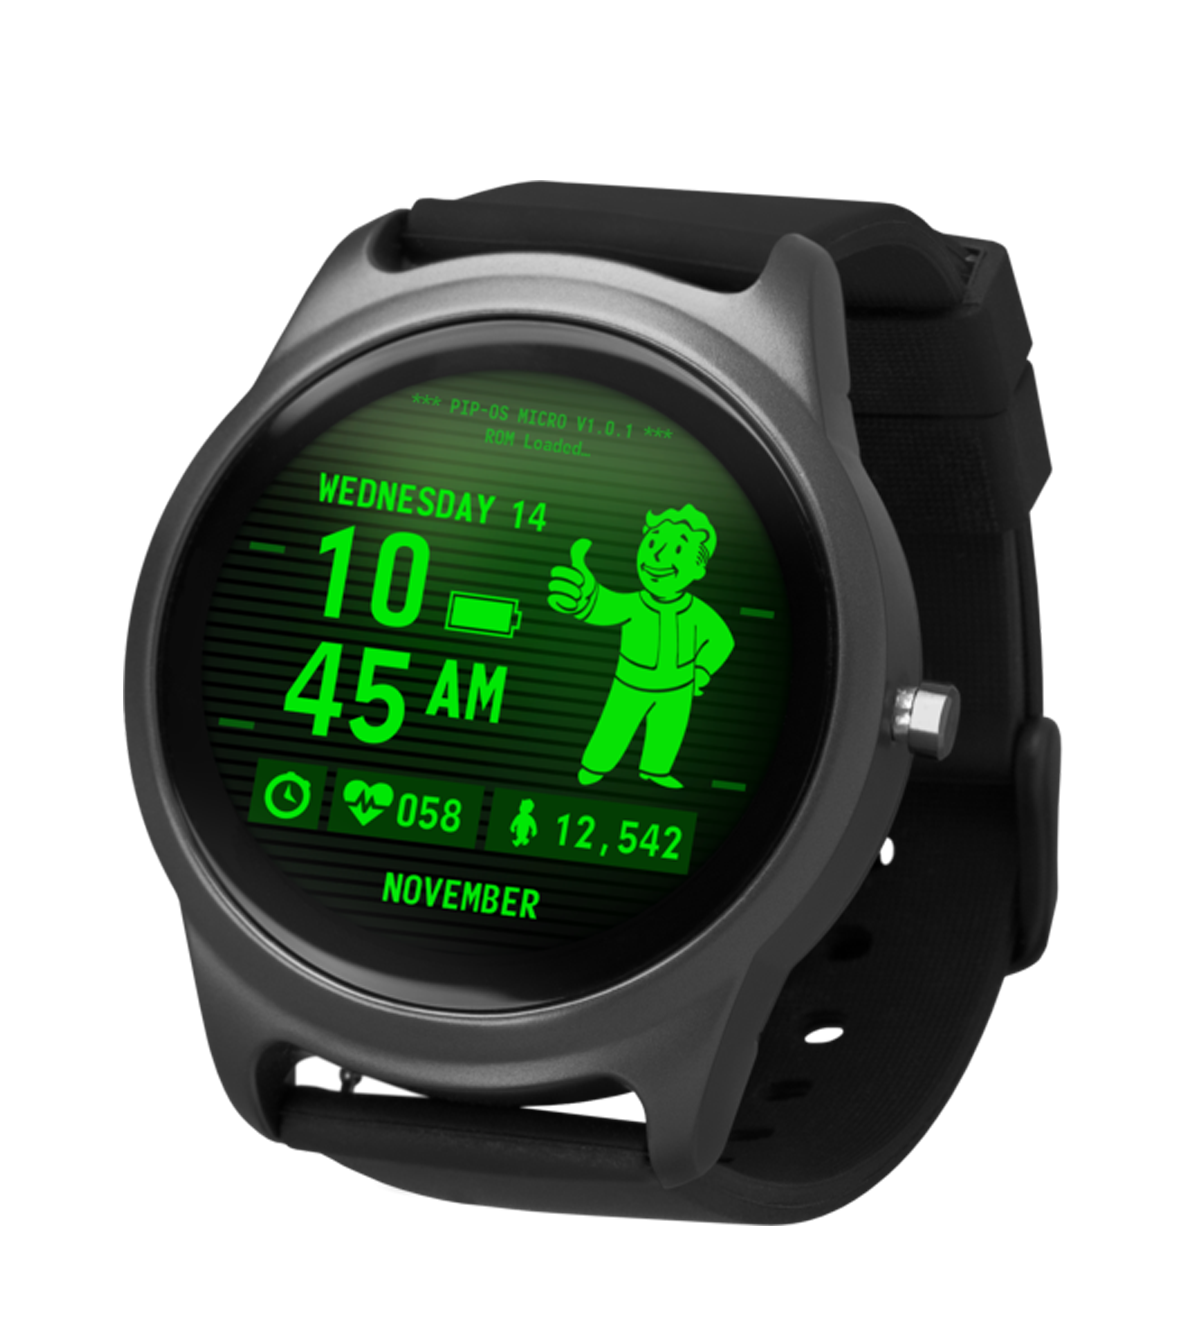 Fallout Smartwatch Smart watch, Pip boy, Fallout